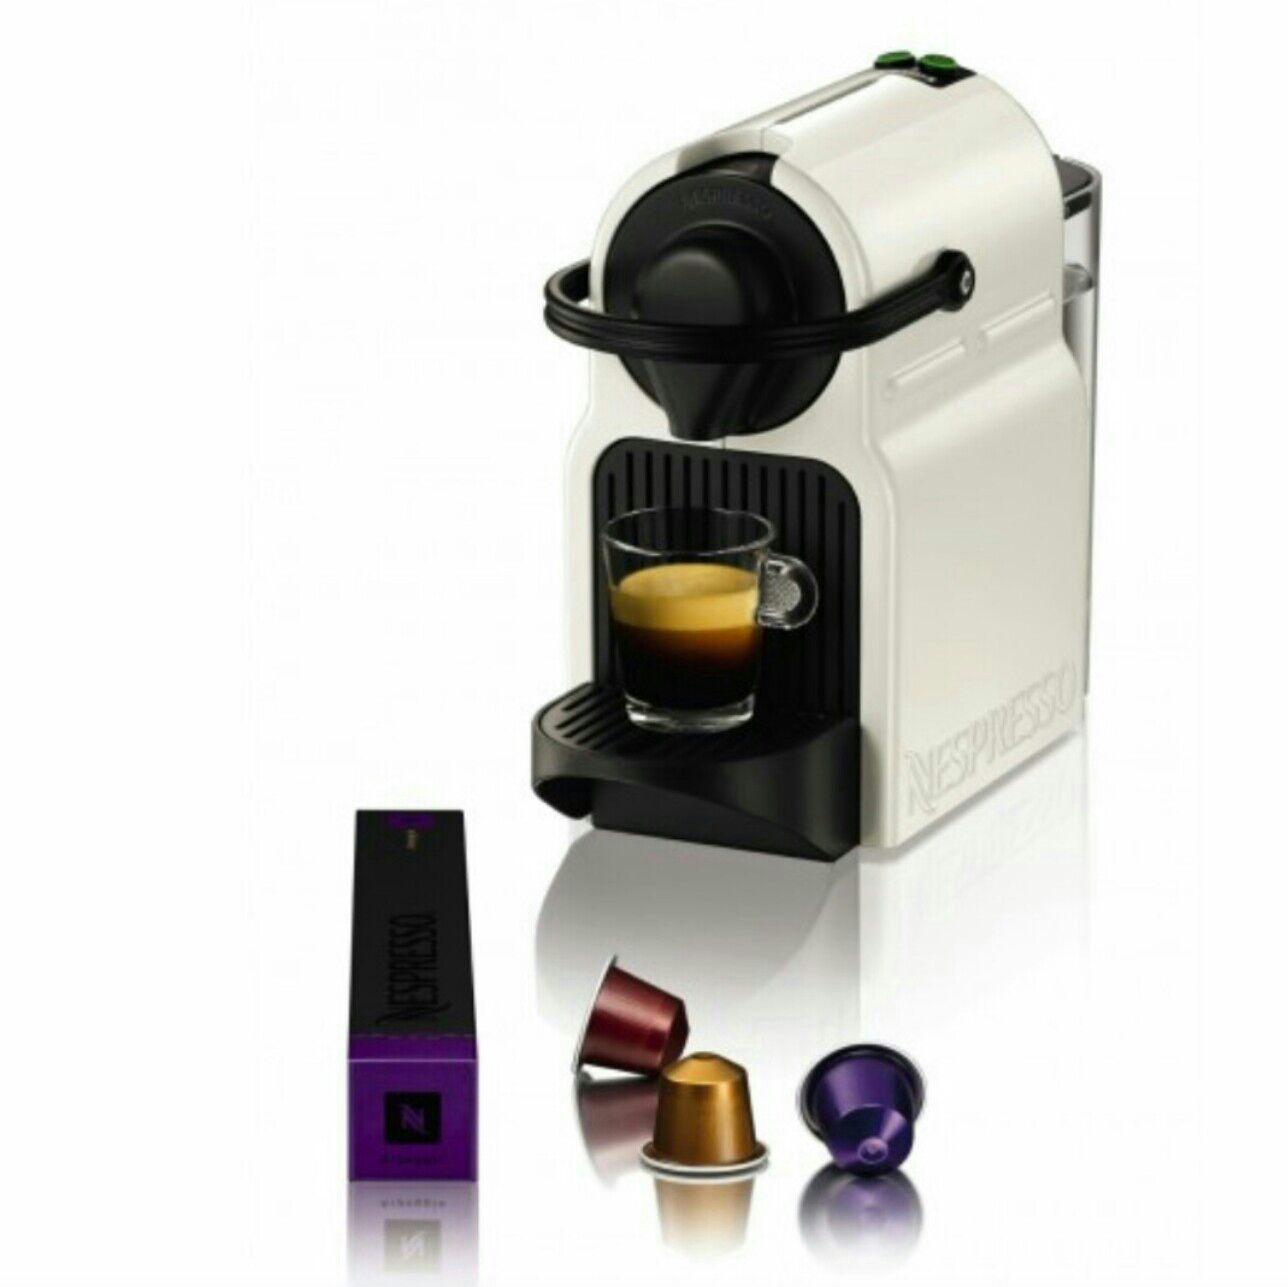 Machine à café Krups Inissia YY1530FD - Blanc